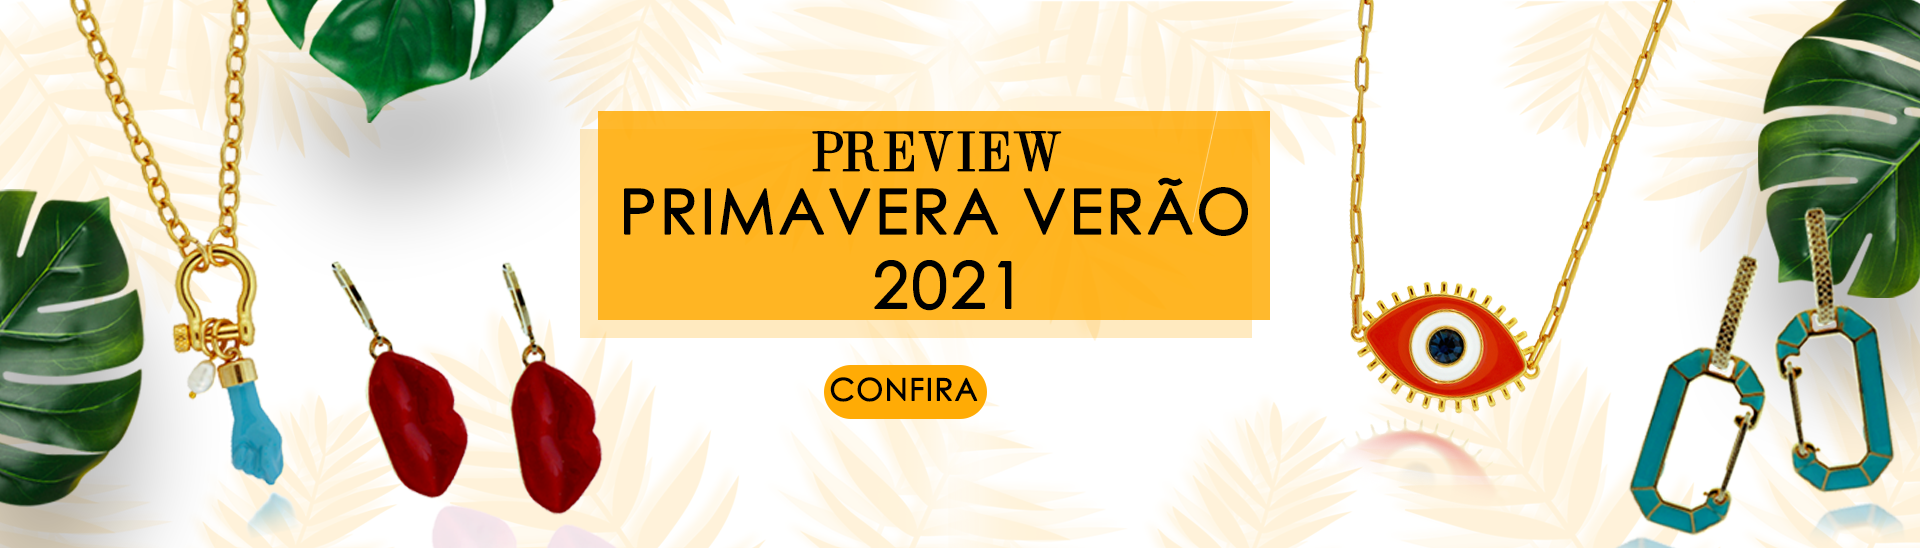 PRIMAVERA VERÃO 2021 DESK